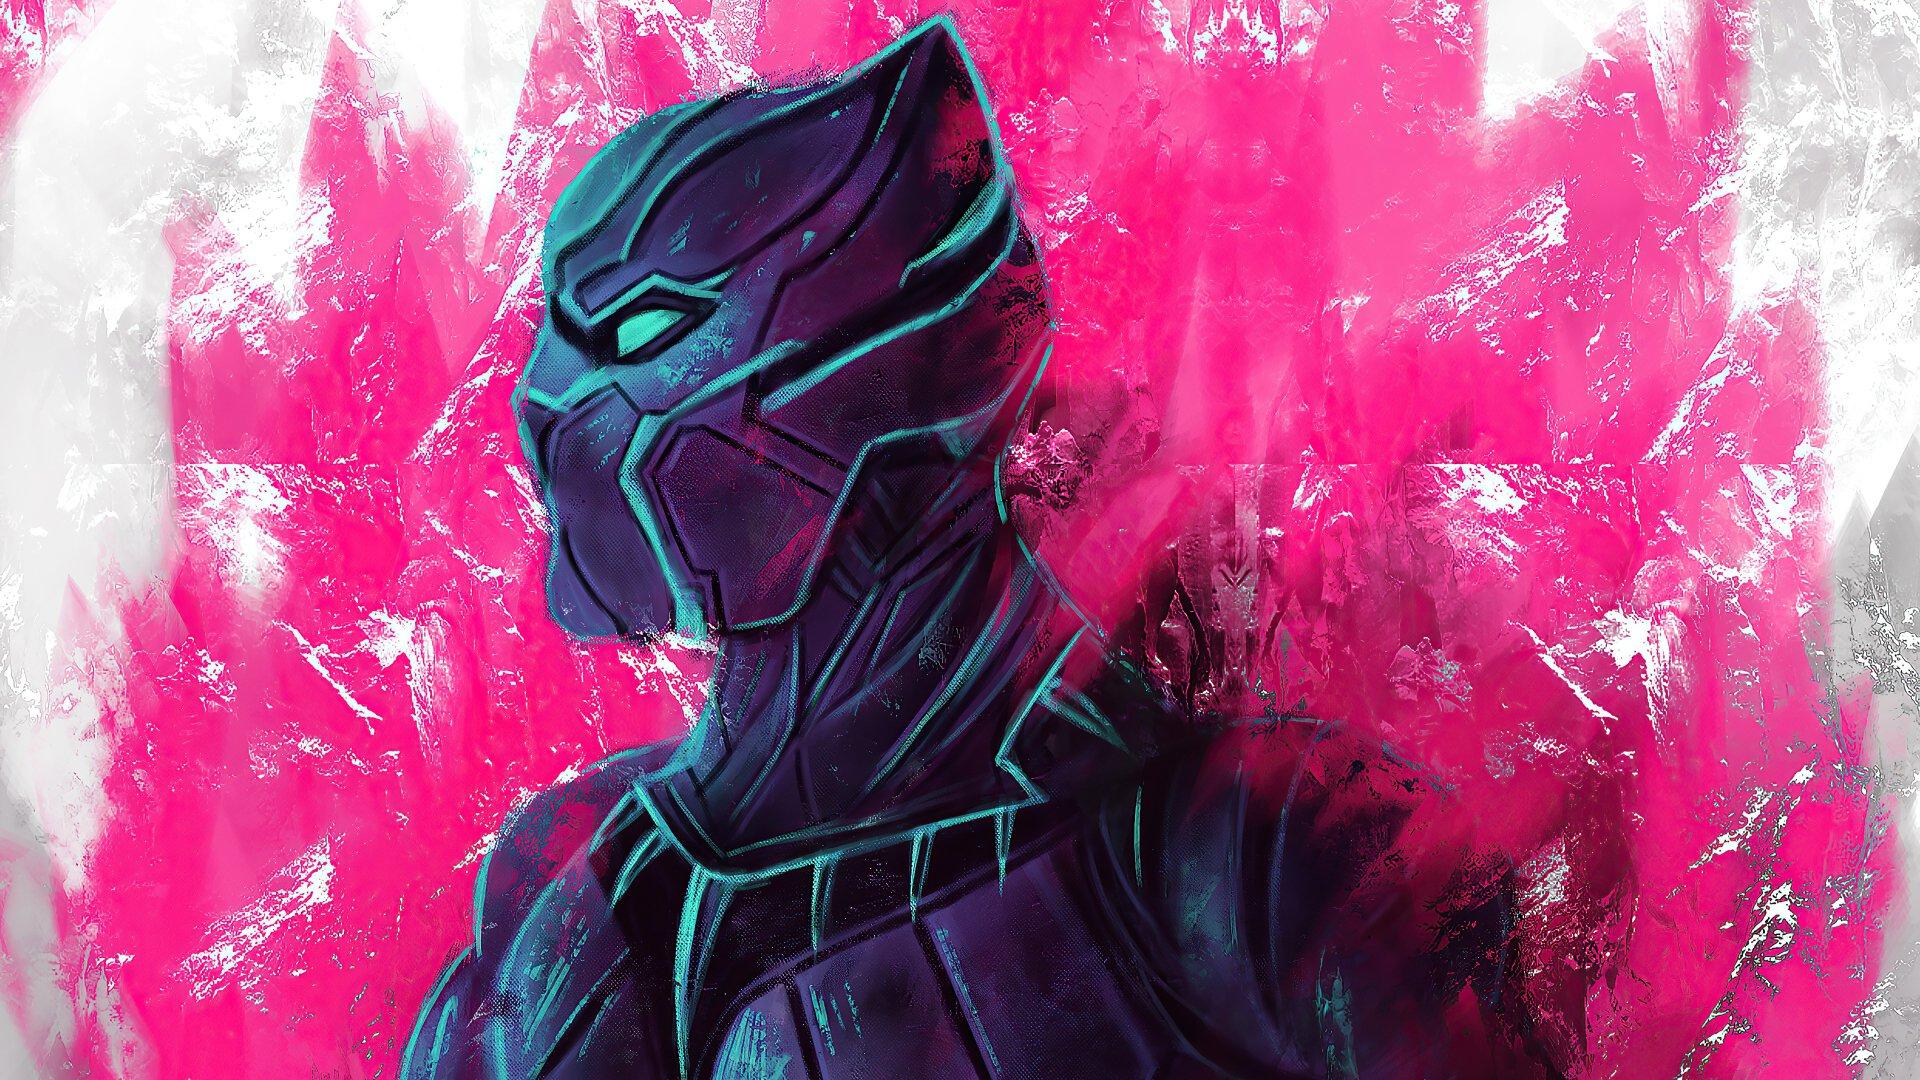 Black Panther 4k Ultra HD Wallpaper | Background Image ...